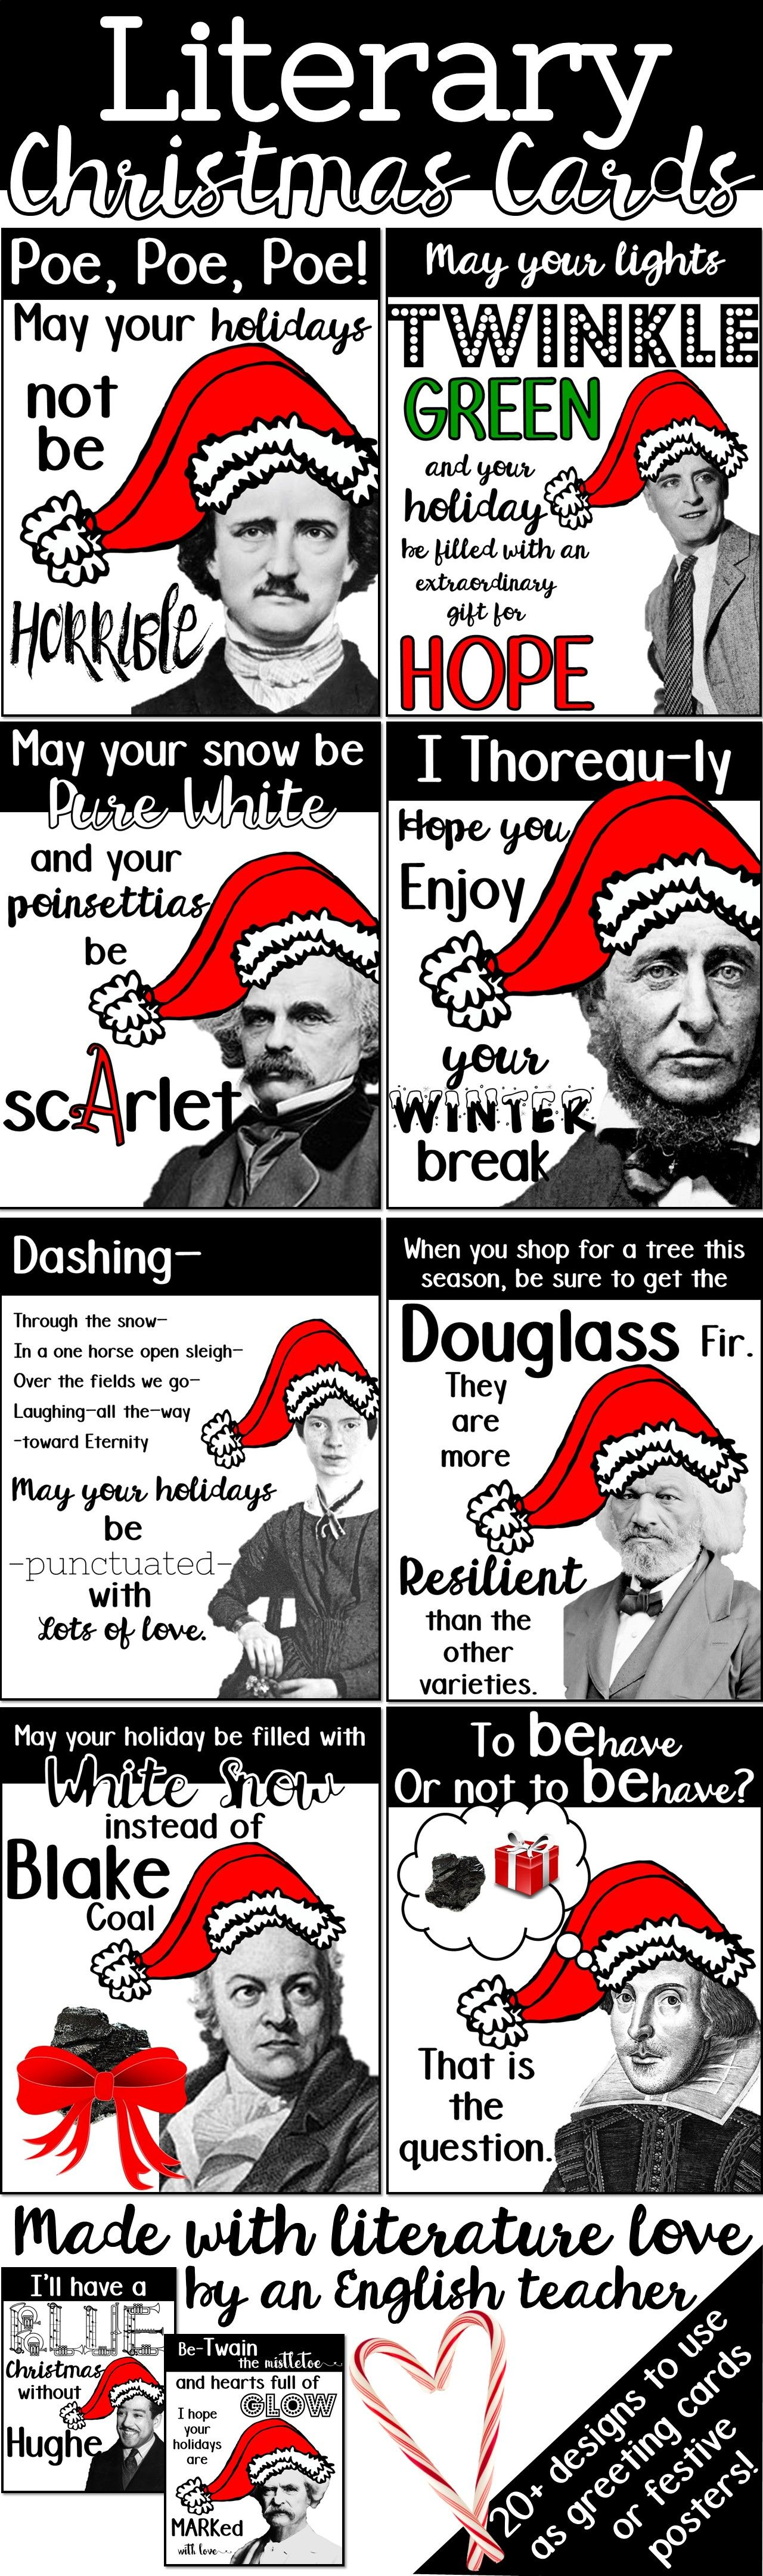 Literary christmas cards english teacher holiday cards student literary christmas cards bookish christmas cards english teacher christmas cards author christmas cards bookish holiday cards bookish greeting cards m4hsunfo